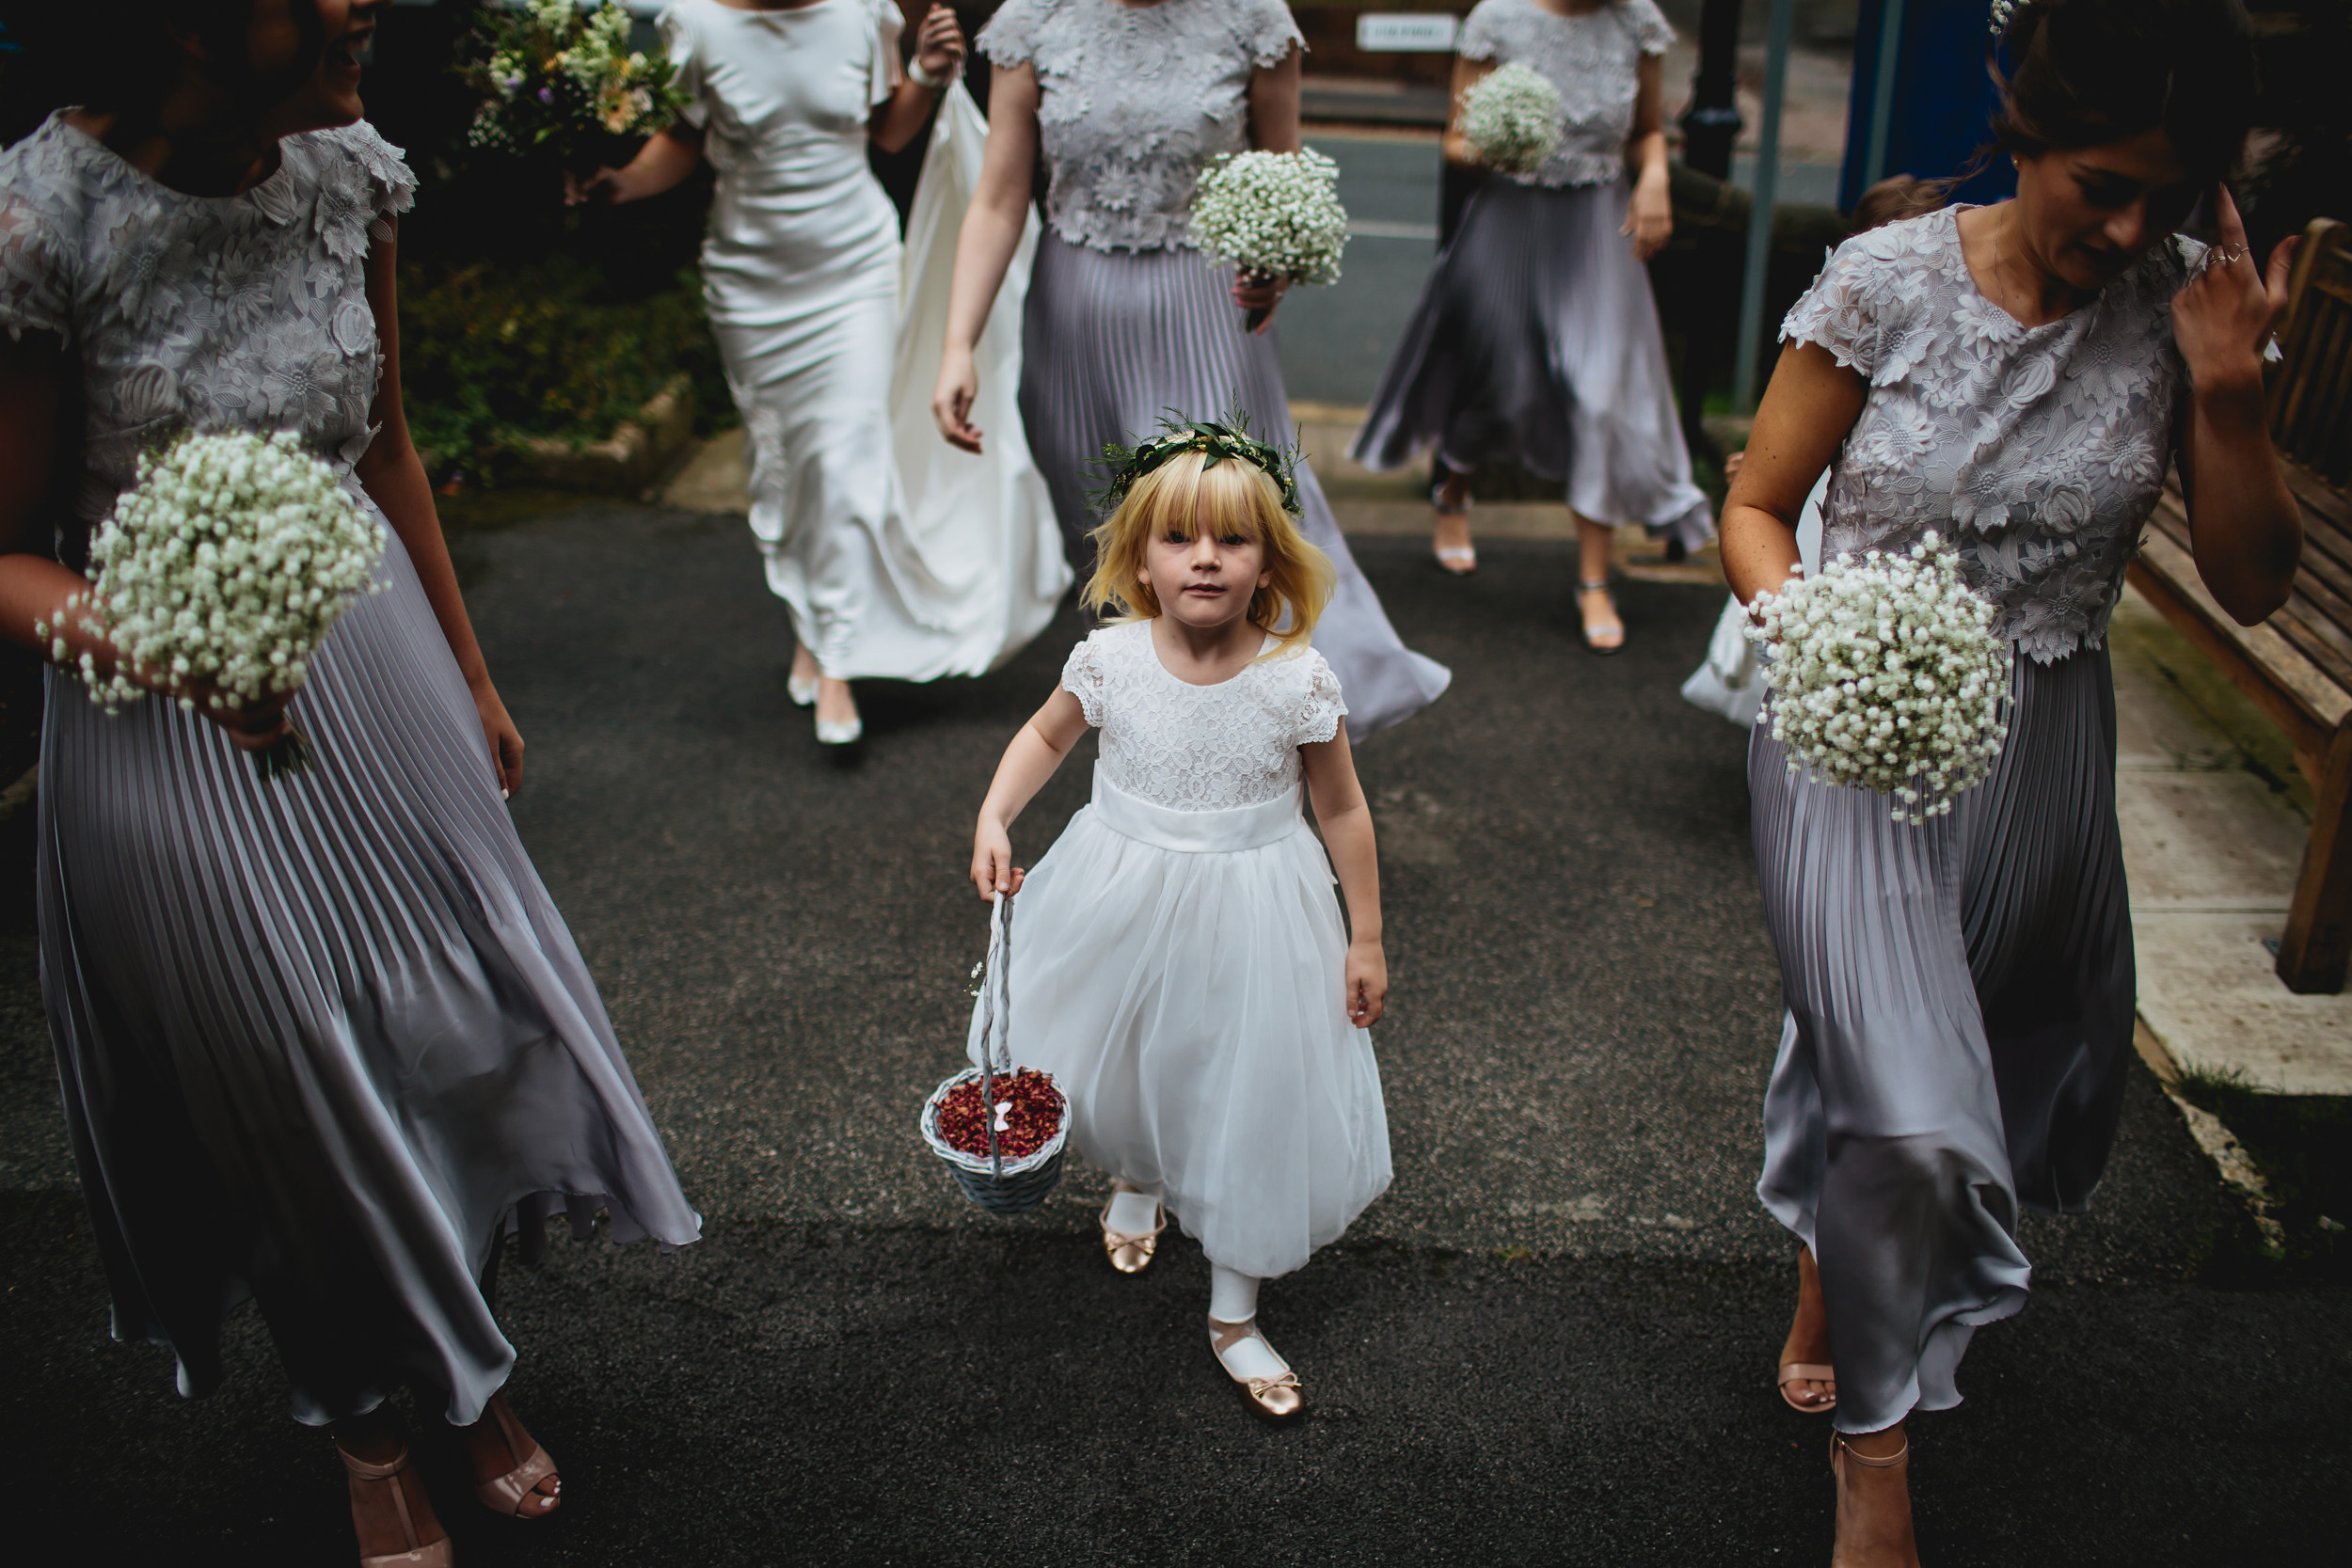 Flower girl walking to the church wedding